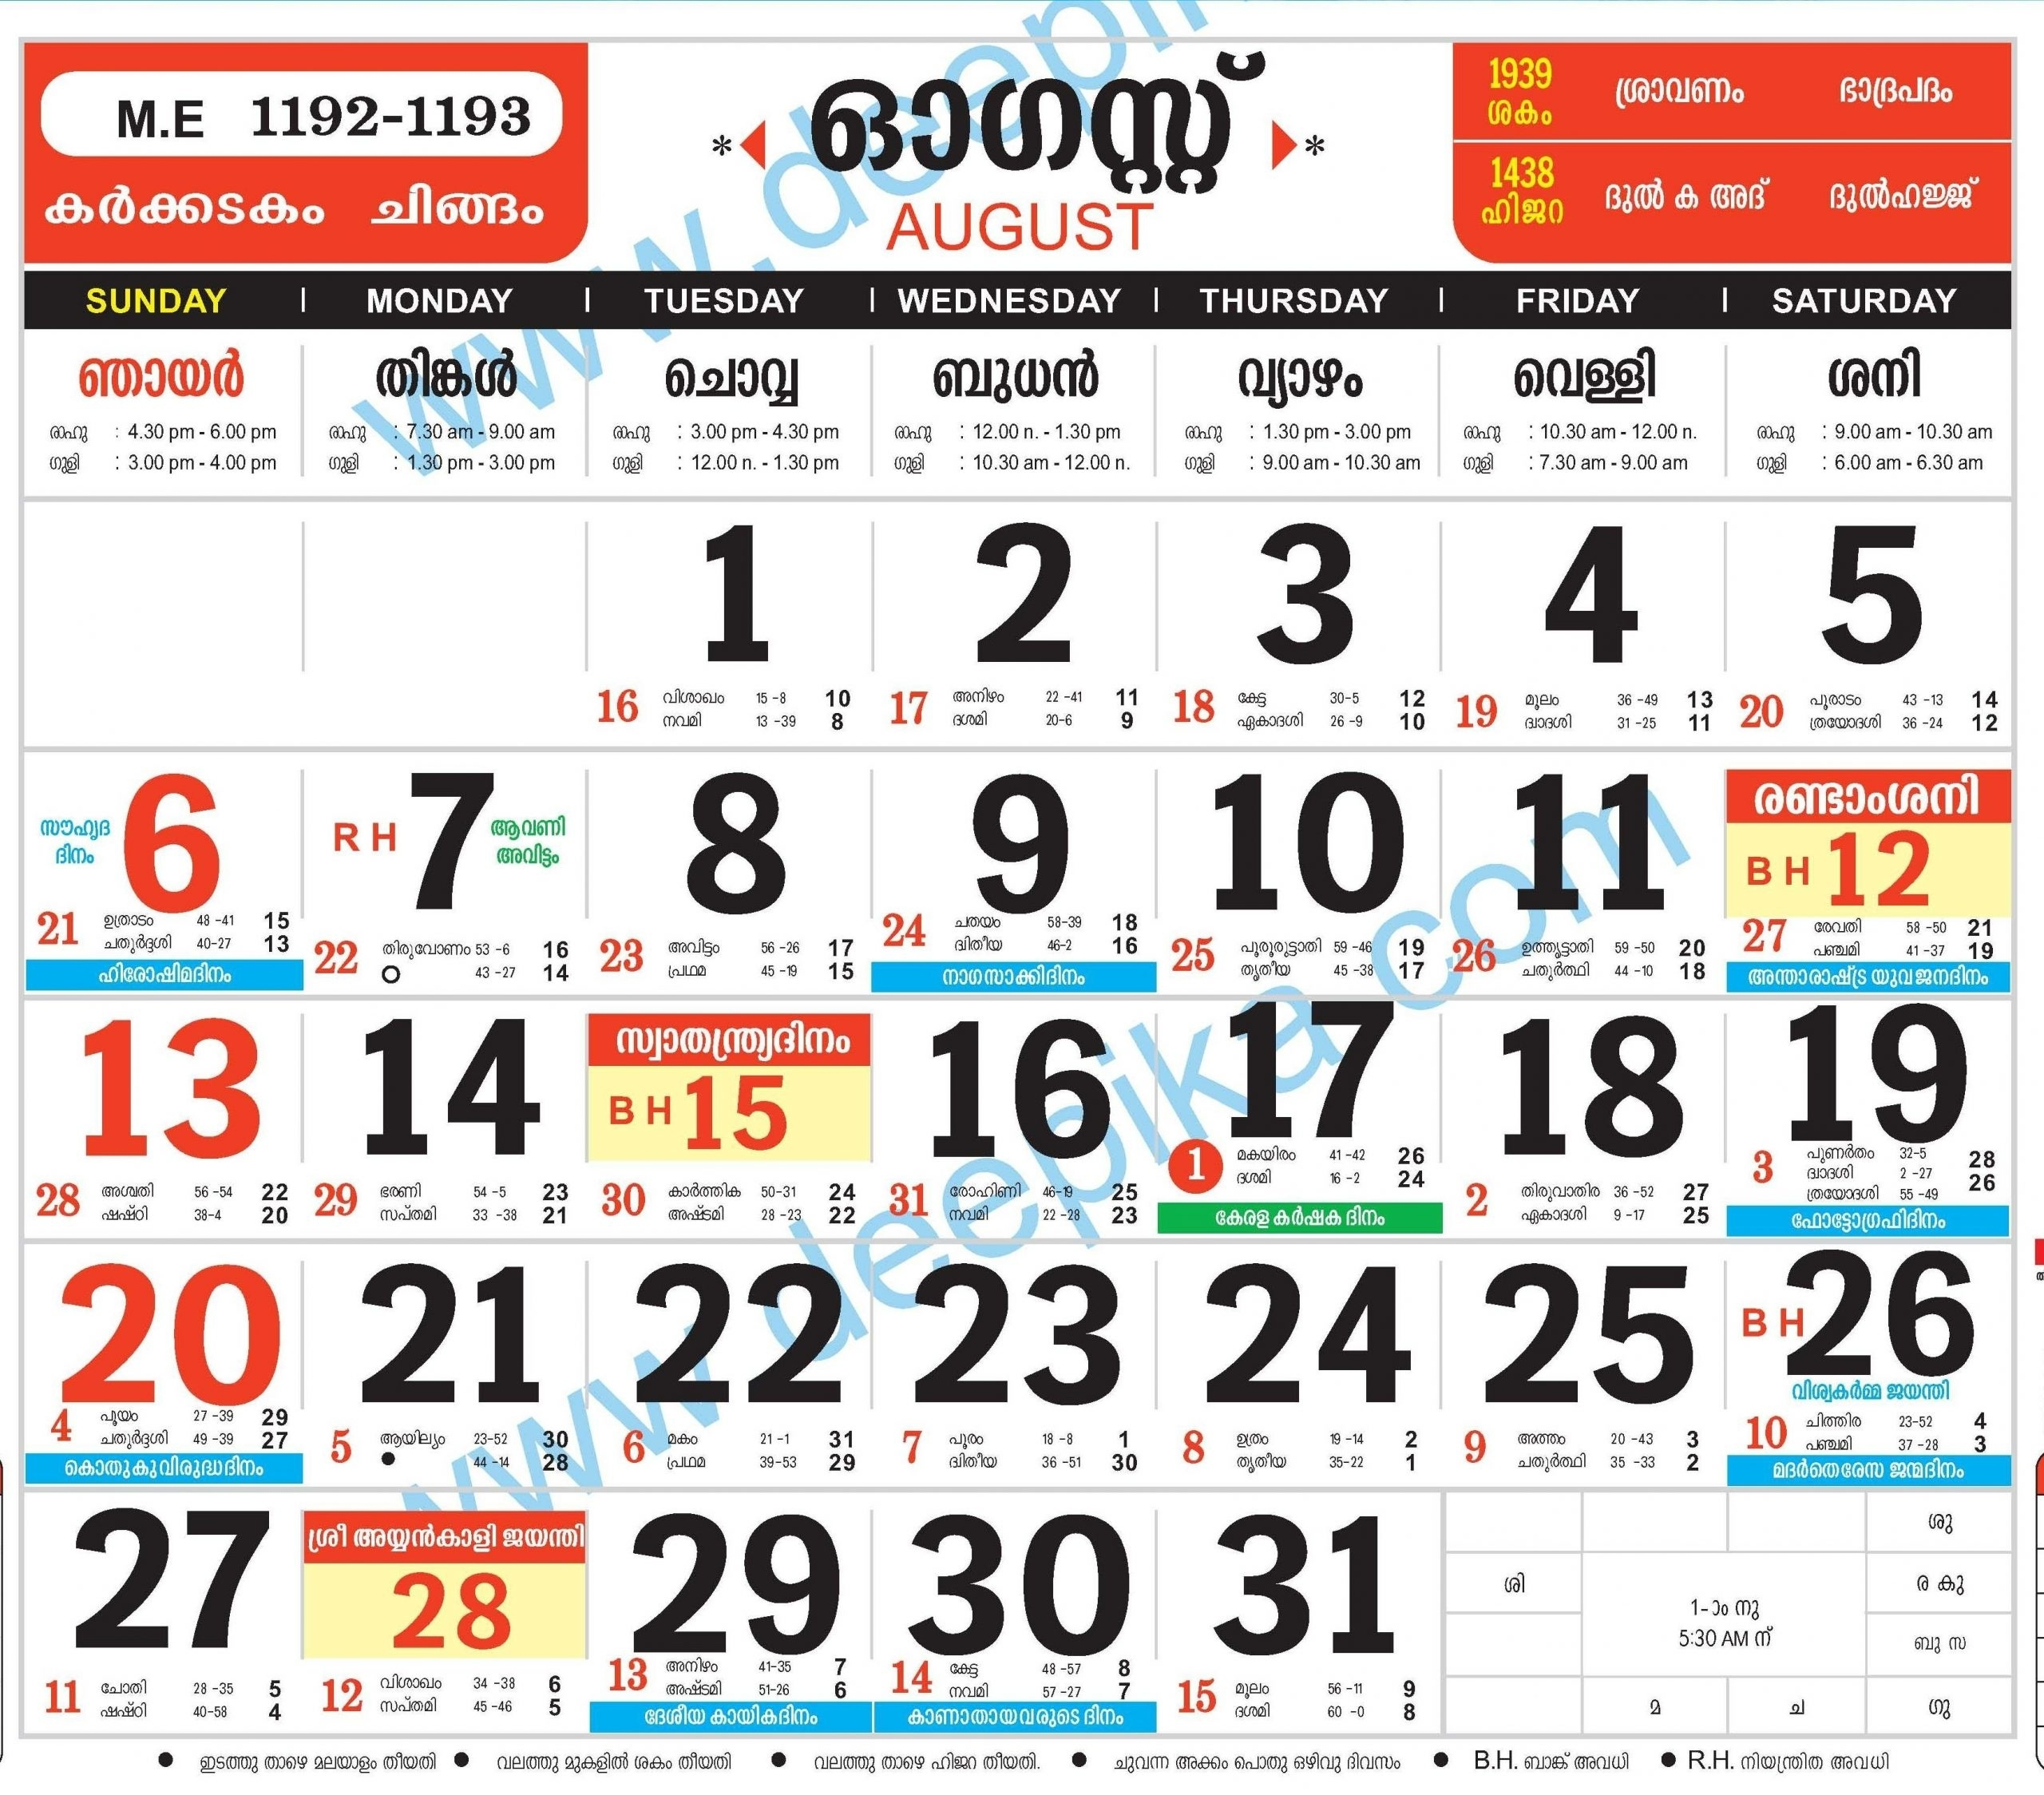 Manorama Calender 2021 - Template Calendar Design Manorama Calendar 2021 September